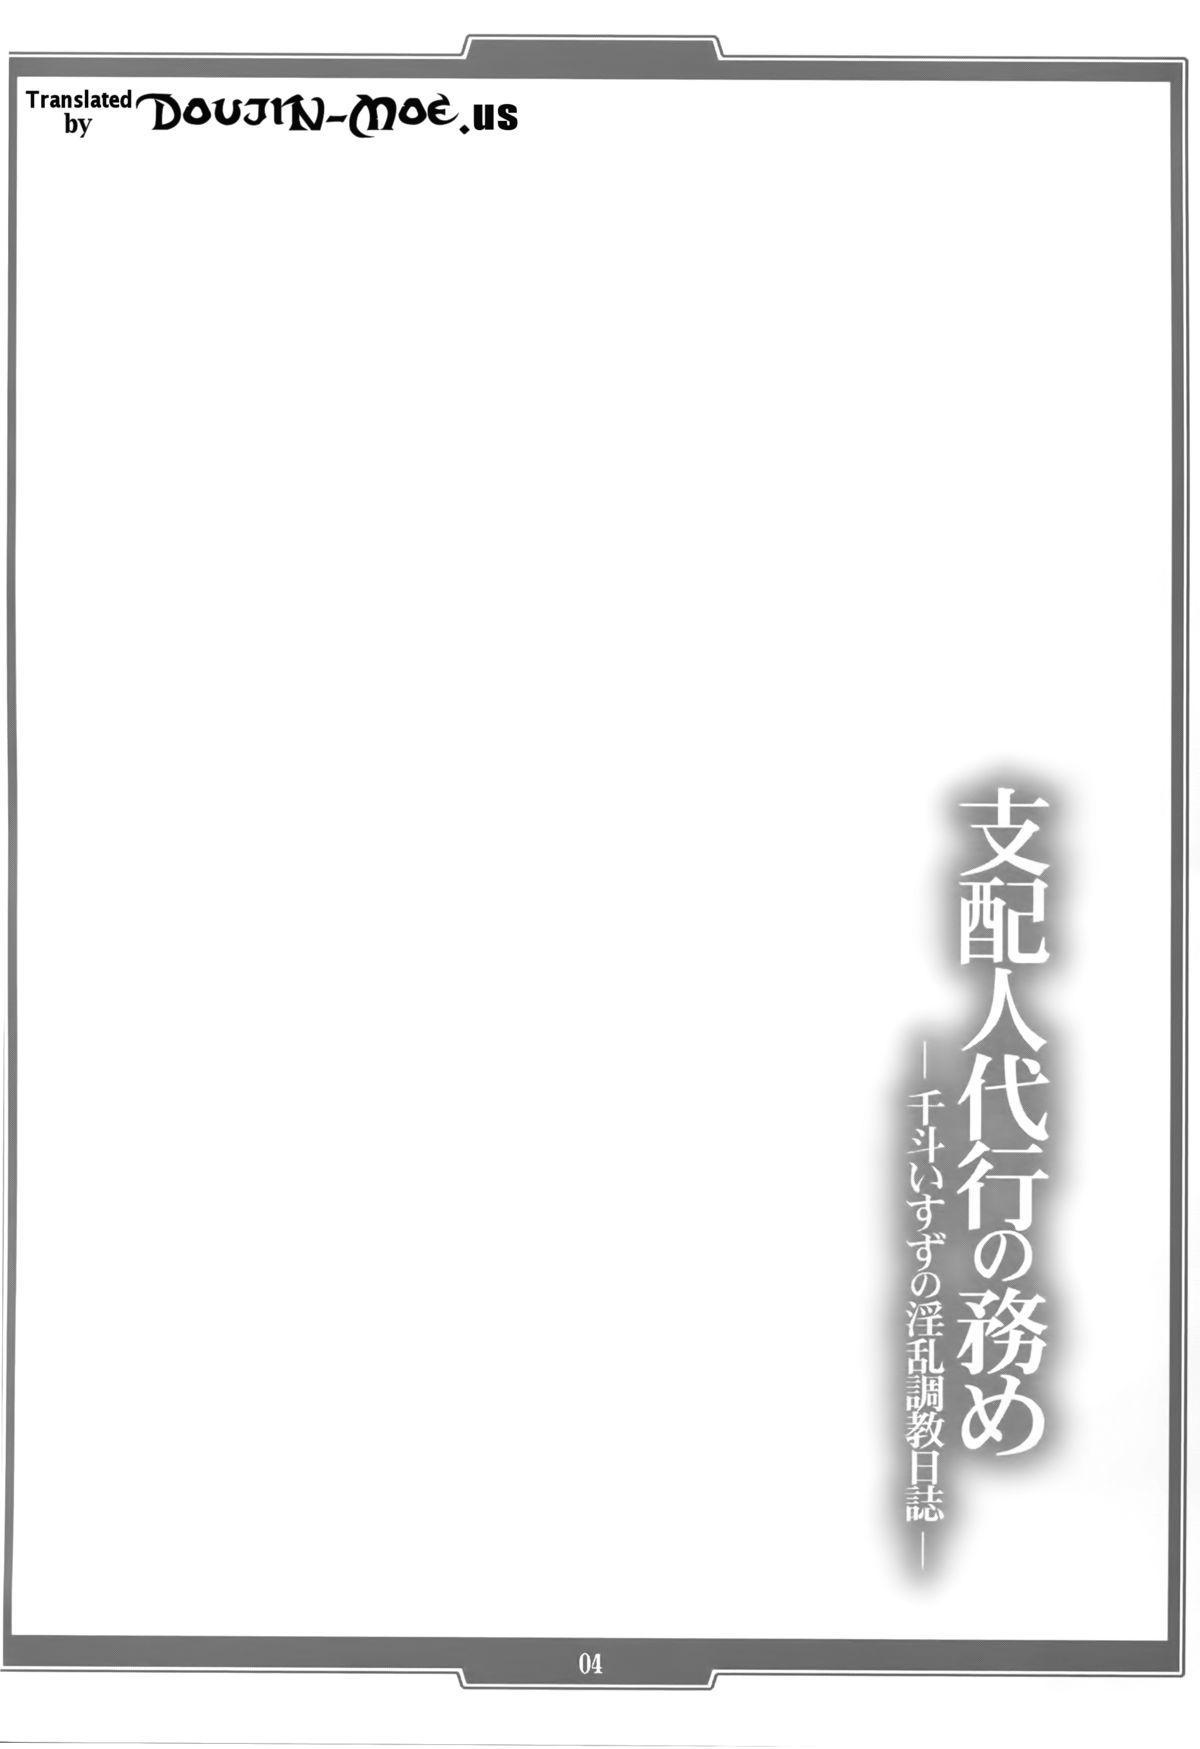 (C87) [H.B (B-RIVER)] Shihainin Daikou no Tsutome -Sento Isuzu no Inran Choukyou Nisshi- | Acting Manager's Duty -Sento Isuzu's Lewd Training Diary- (Amagi Brilliant Park) [English] [doujin-moe.us] 2